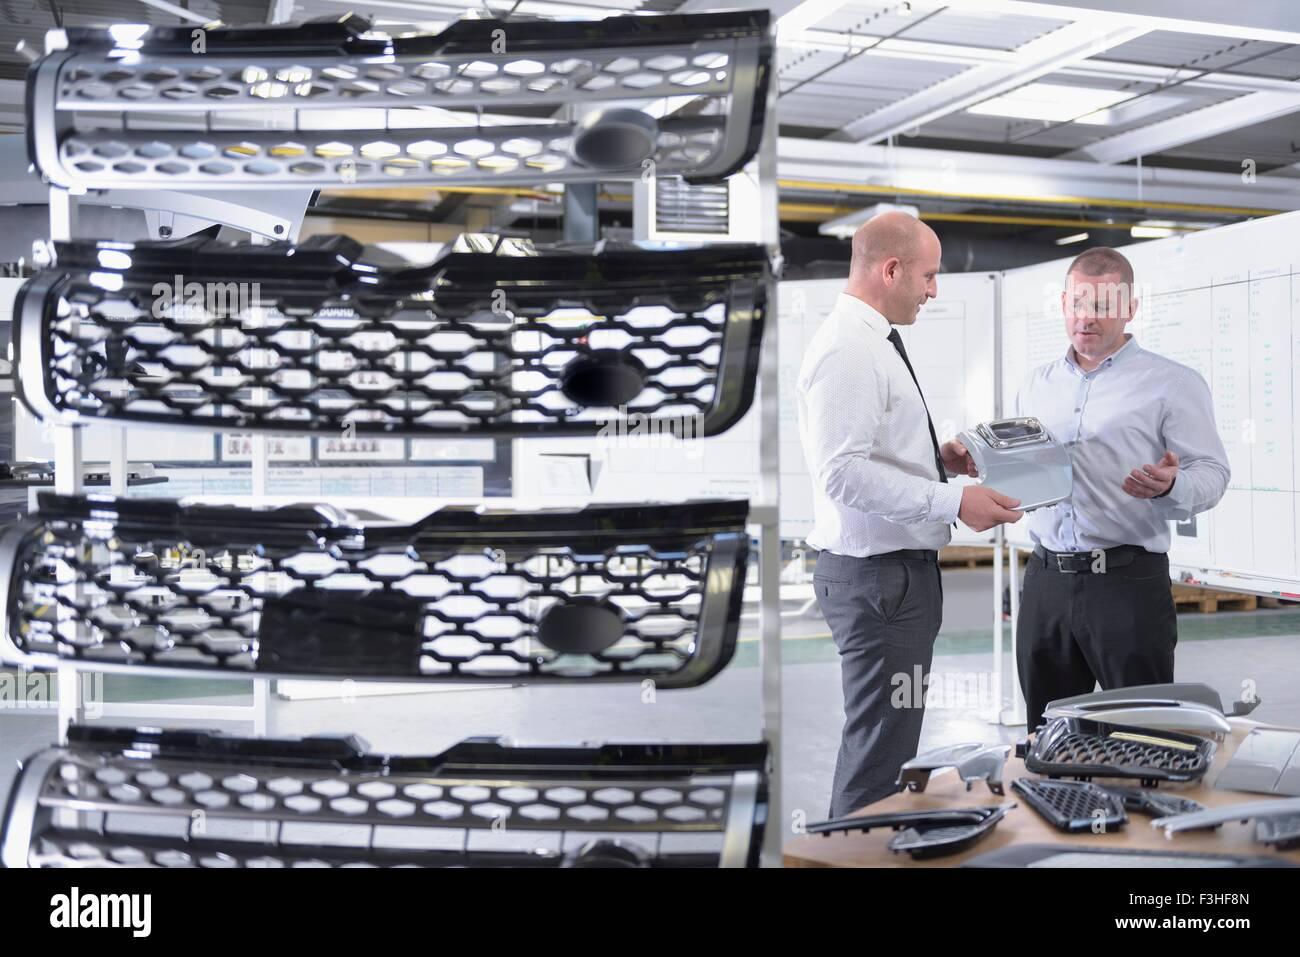 Automobile Parts Stockfotos & Automobile Parts Bilder - Alamy